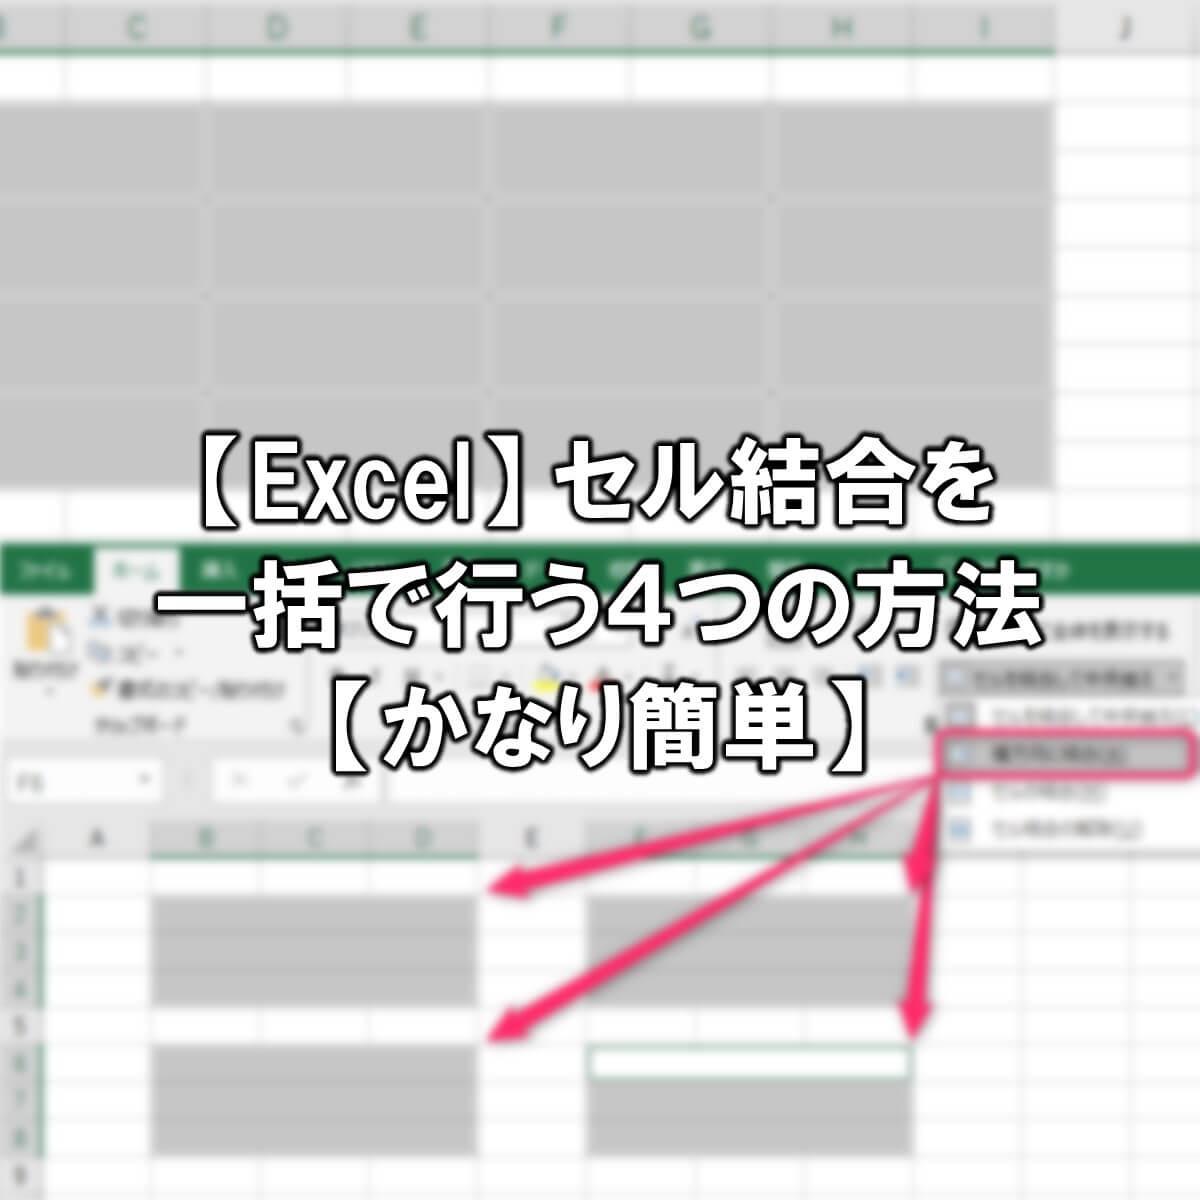 【Excel】セル結合を一括で行う4つの方法【かなり簡単】